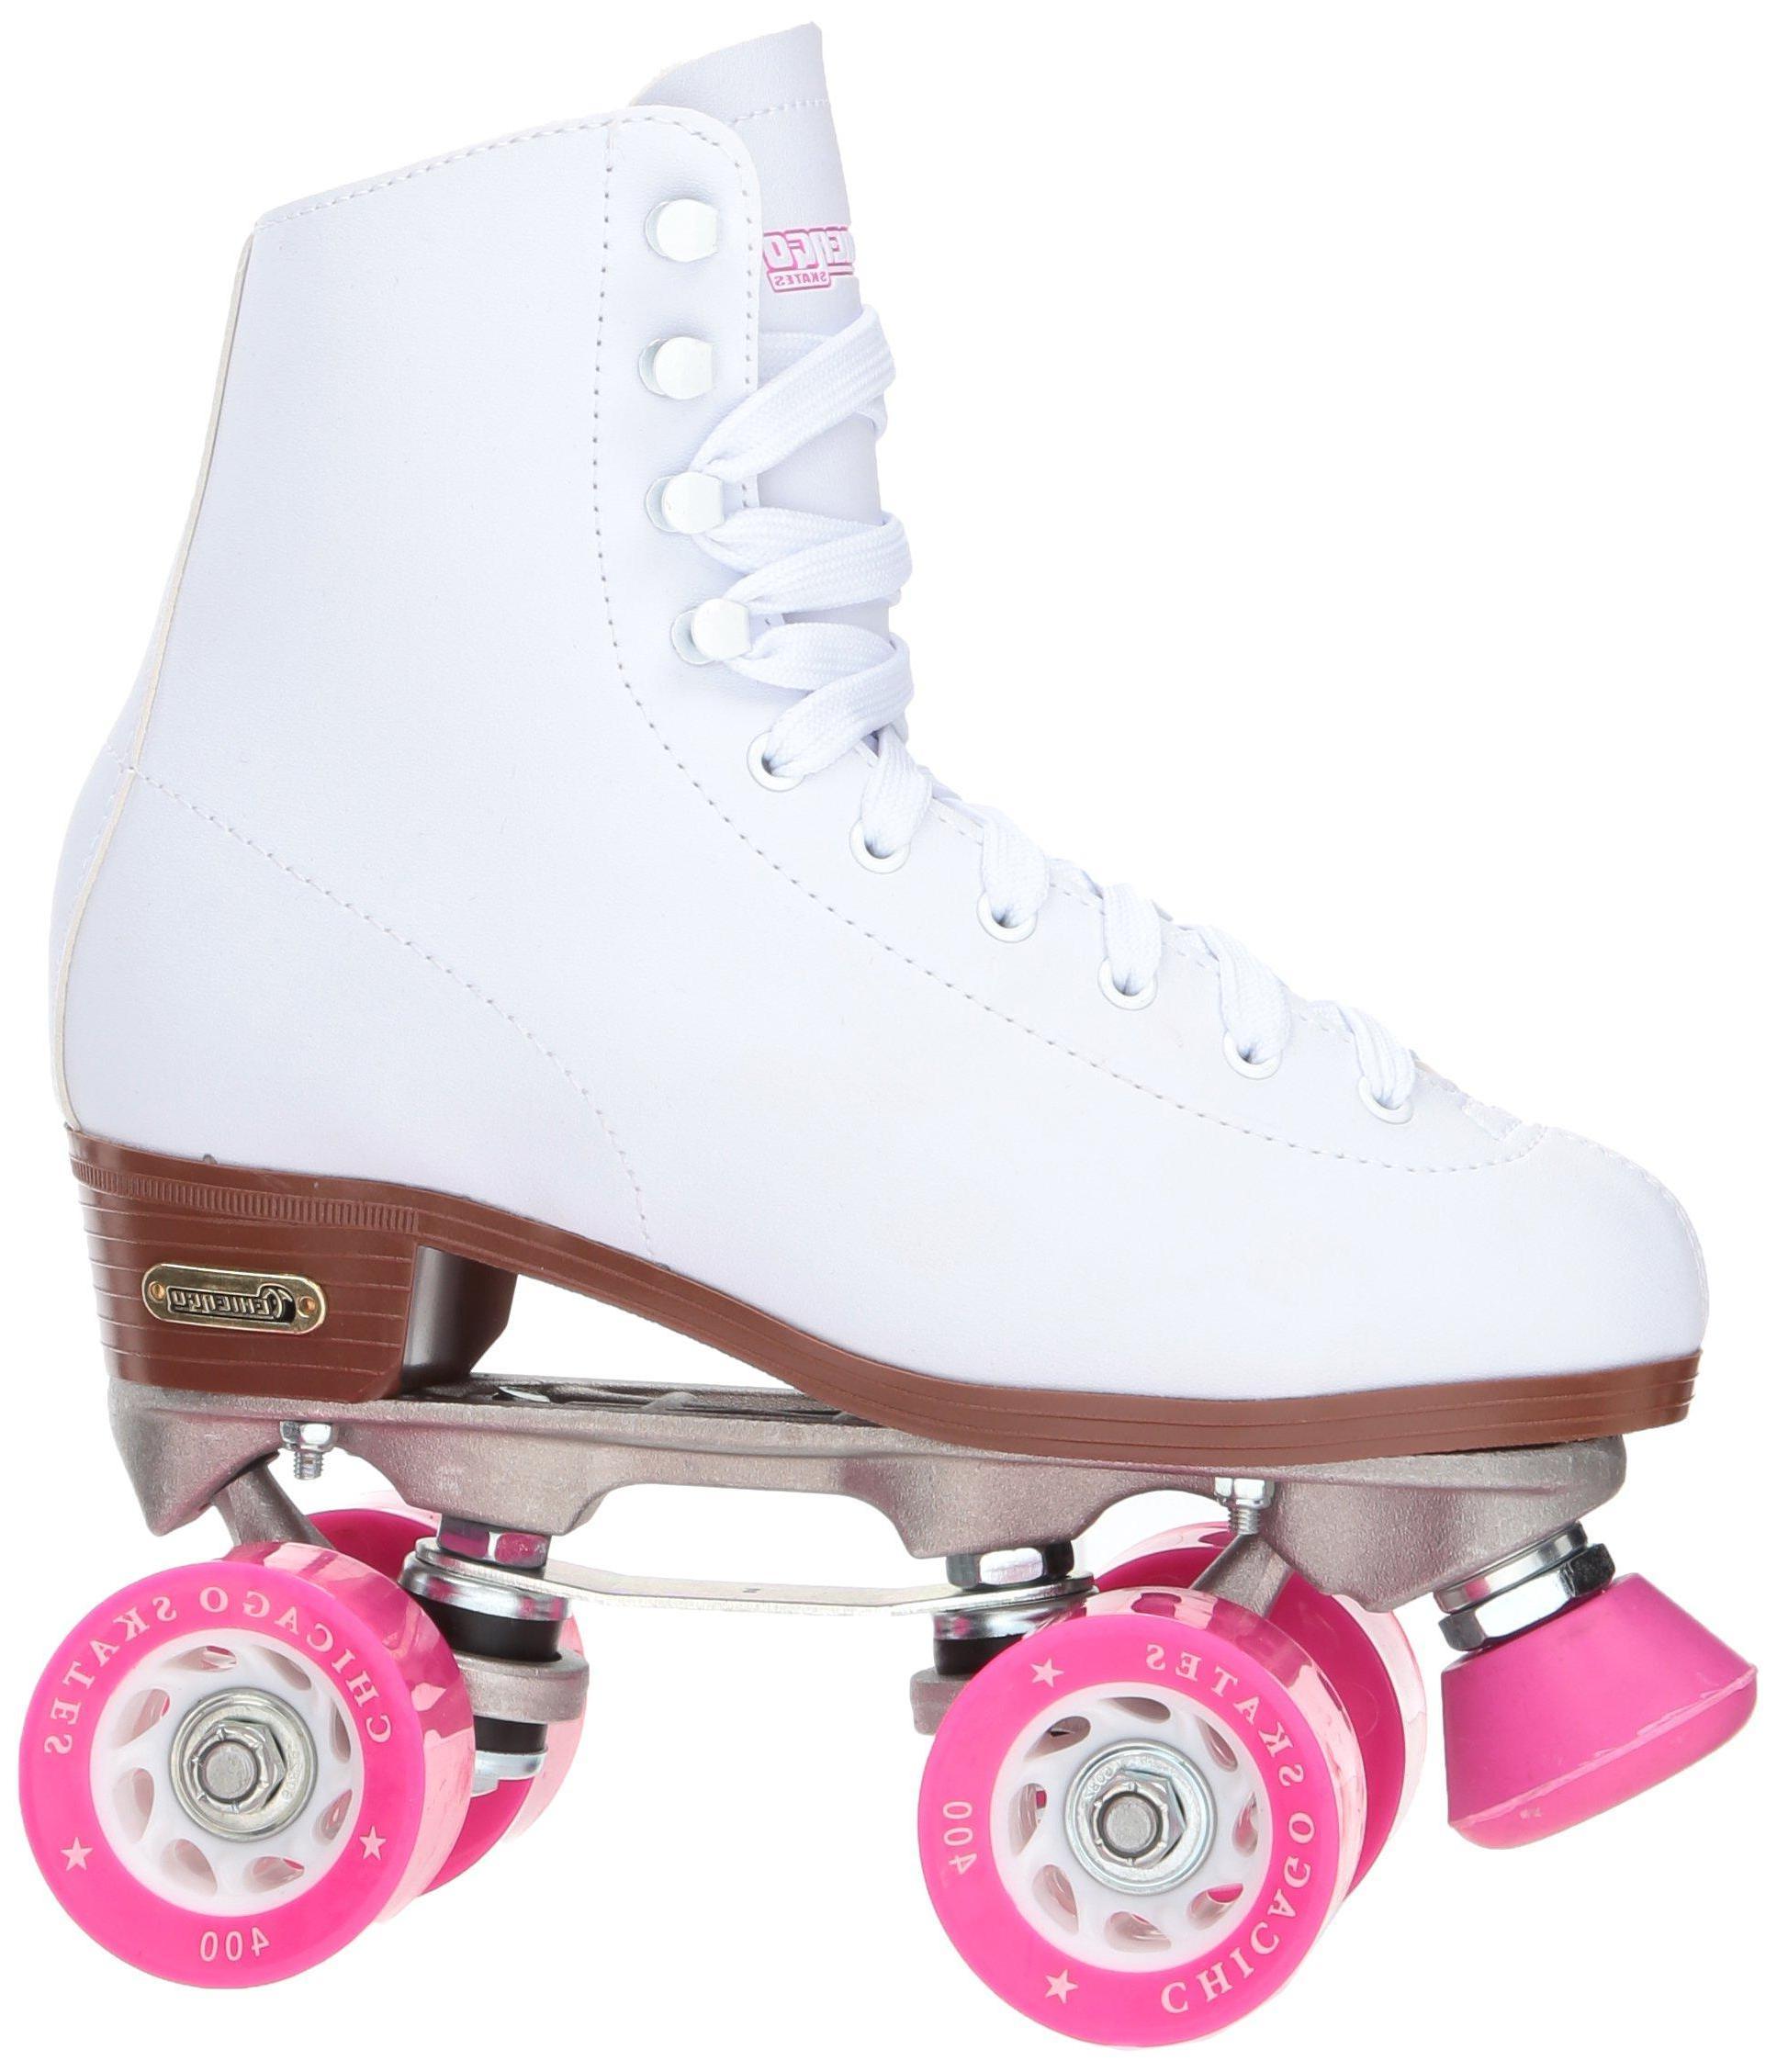 Chicago Women's Skates Skates - 8